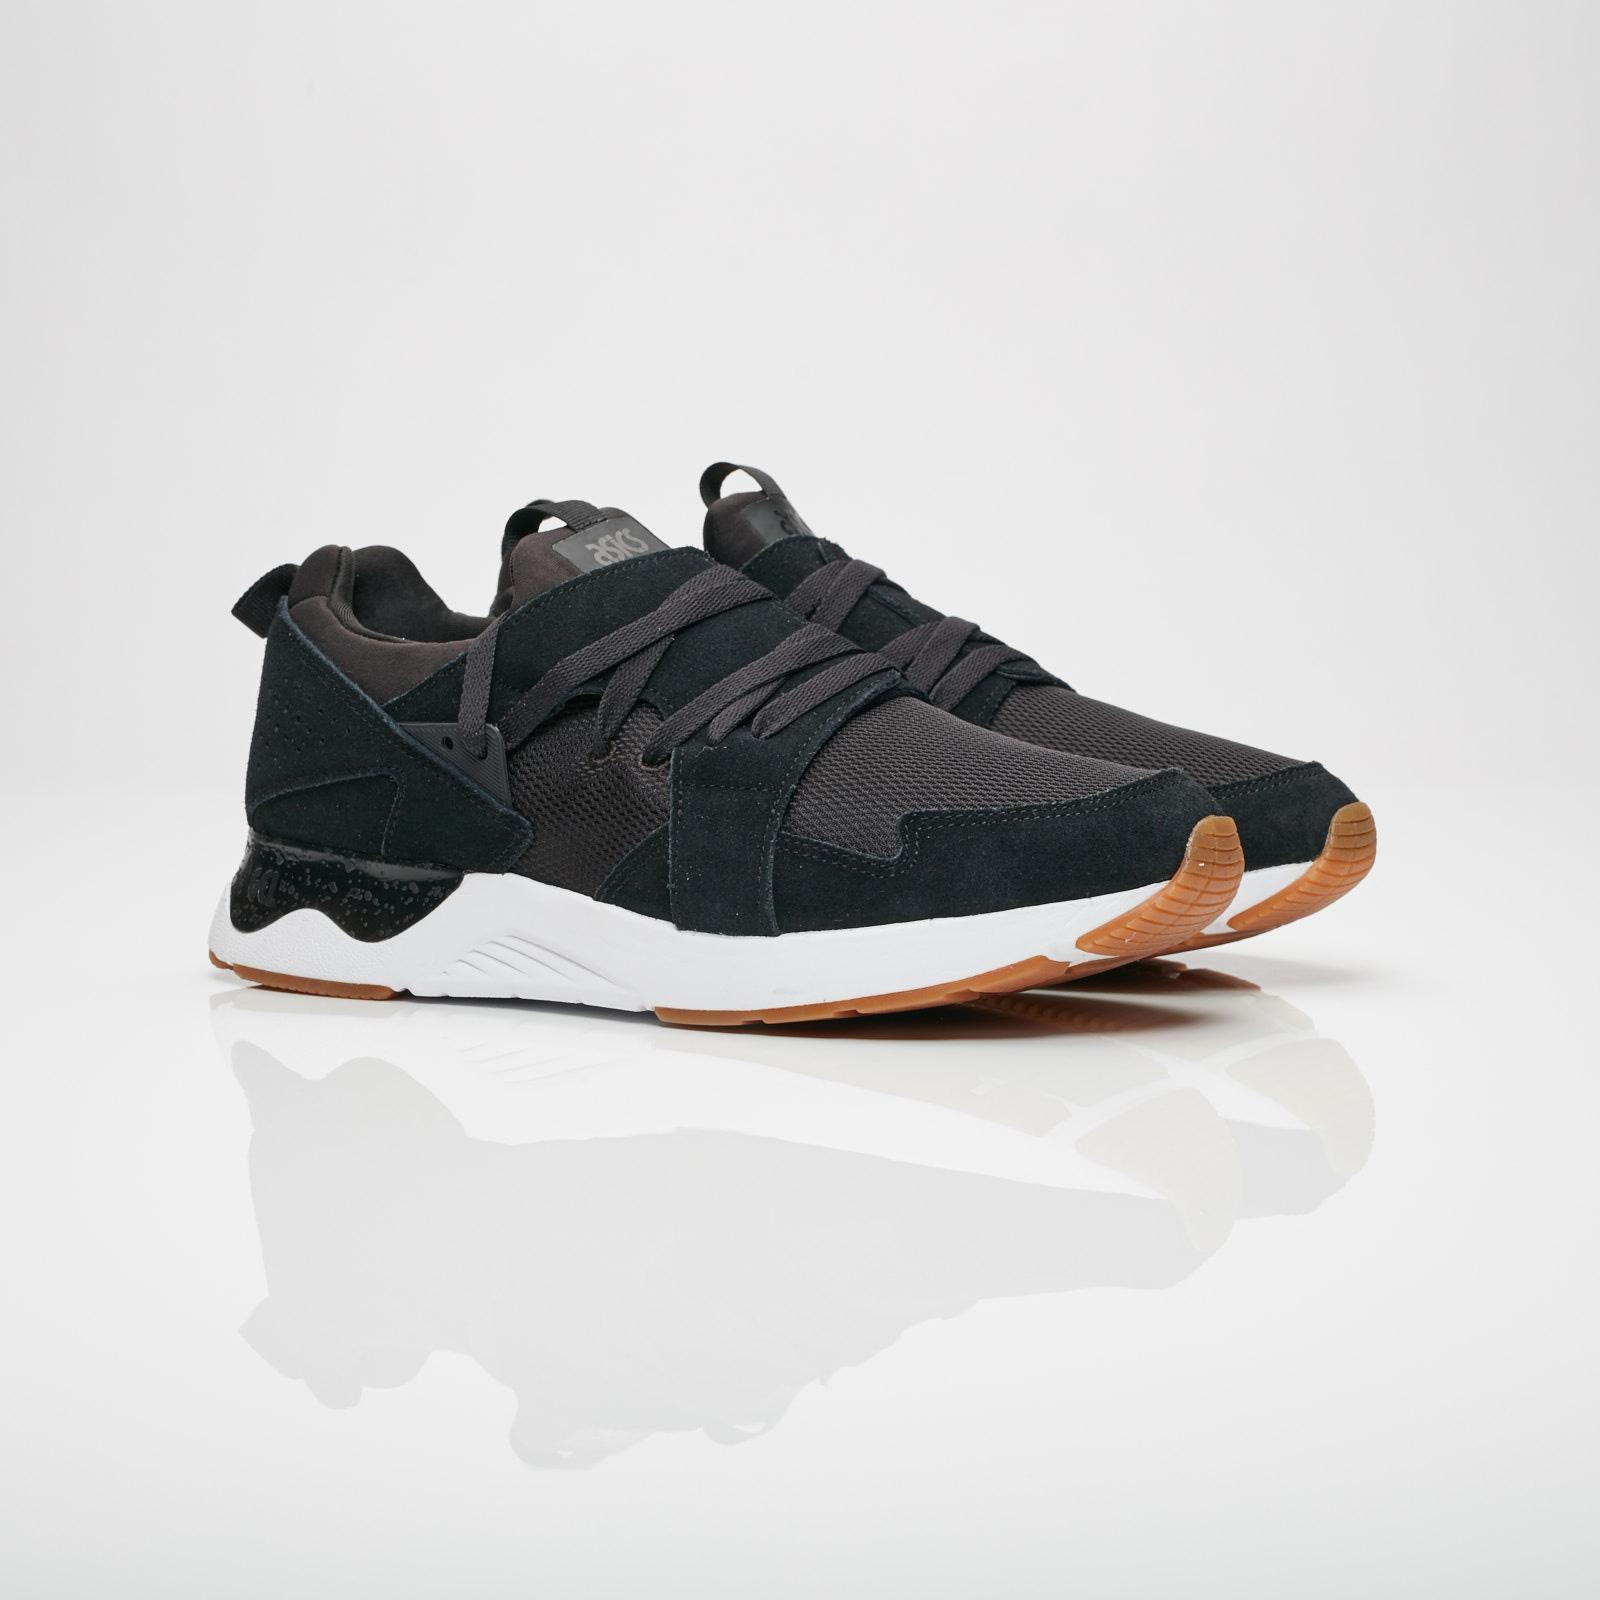 Asics Tiger Gel-Lyte V Sanze Tr Black Sneakers factory outlet pre order amazon hot sale for sale qjhv5EA